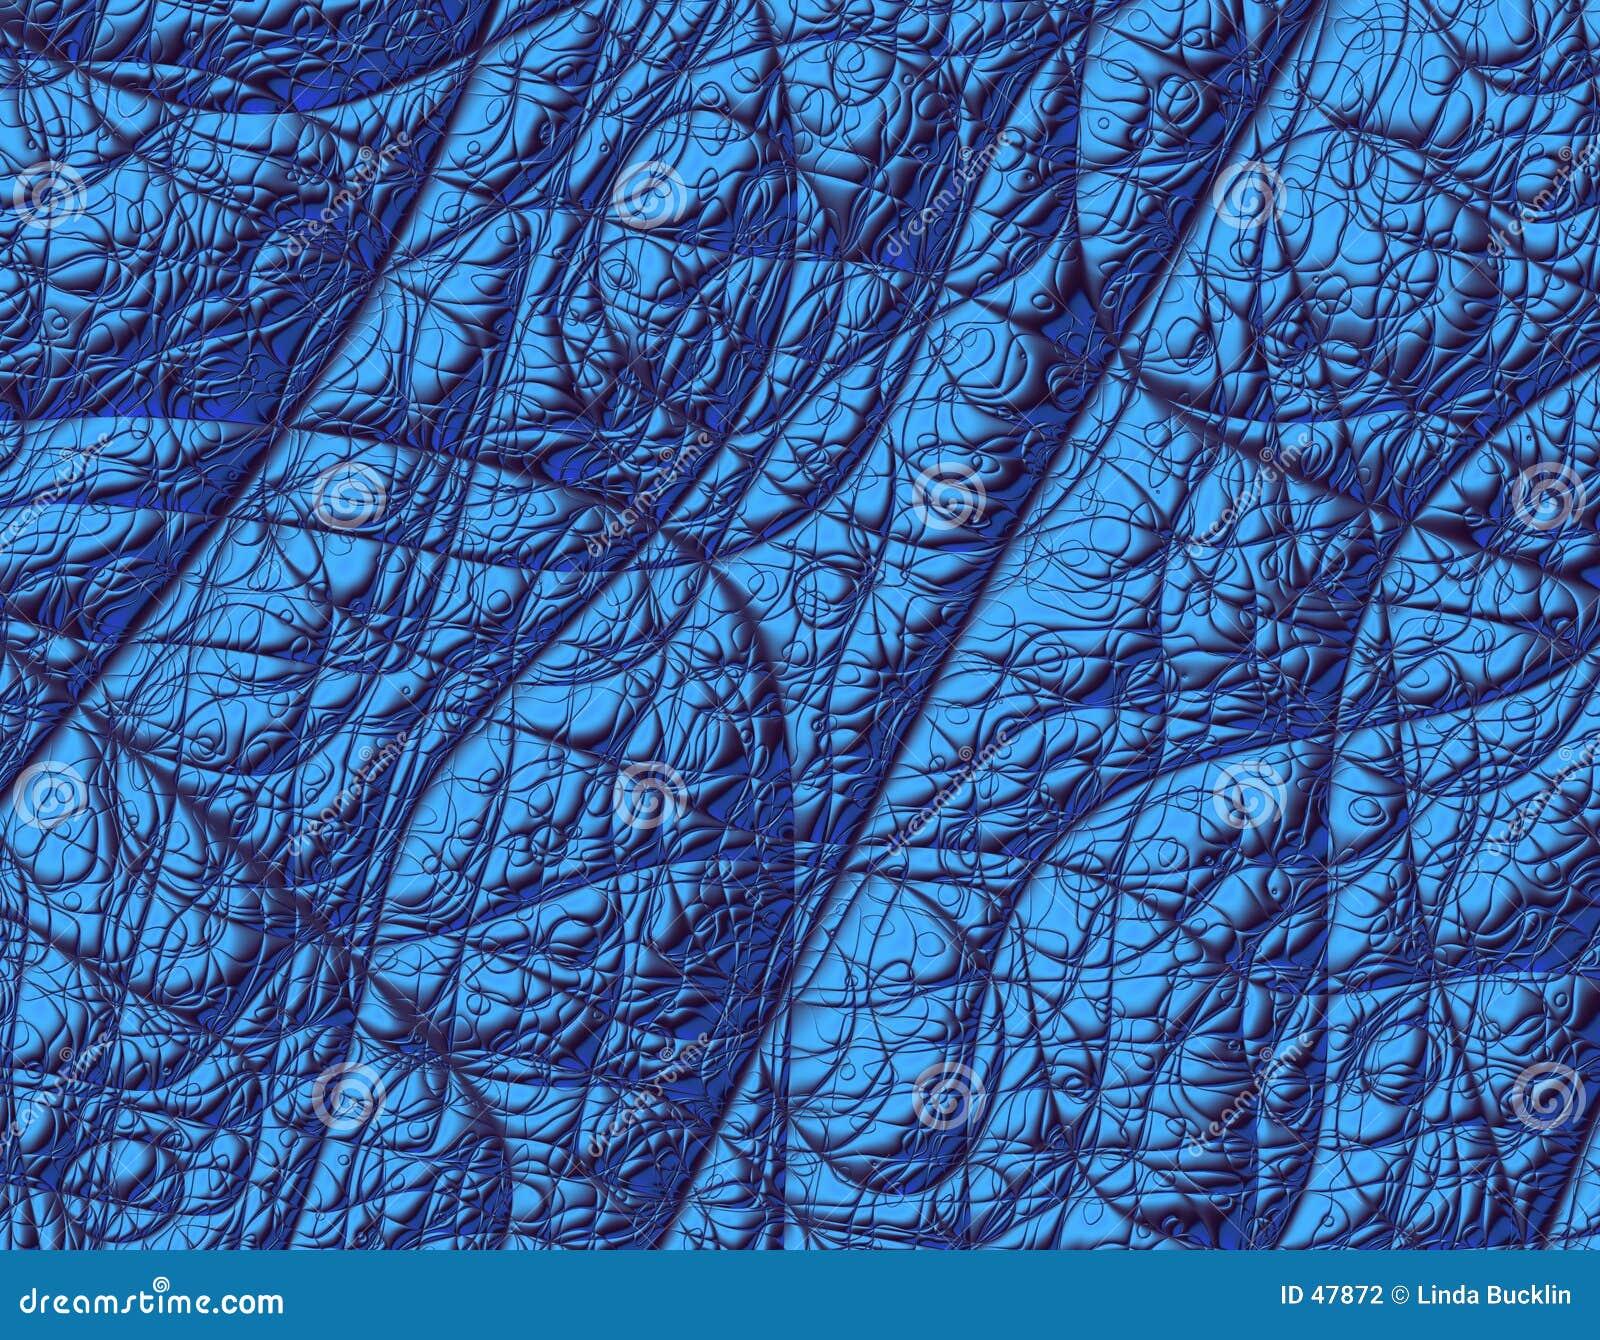 Metallic Blue Fractal Texture